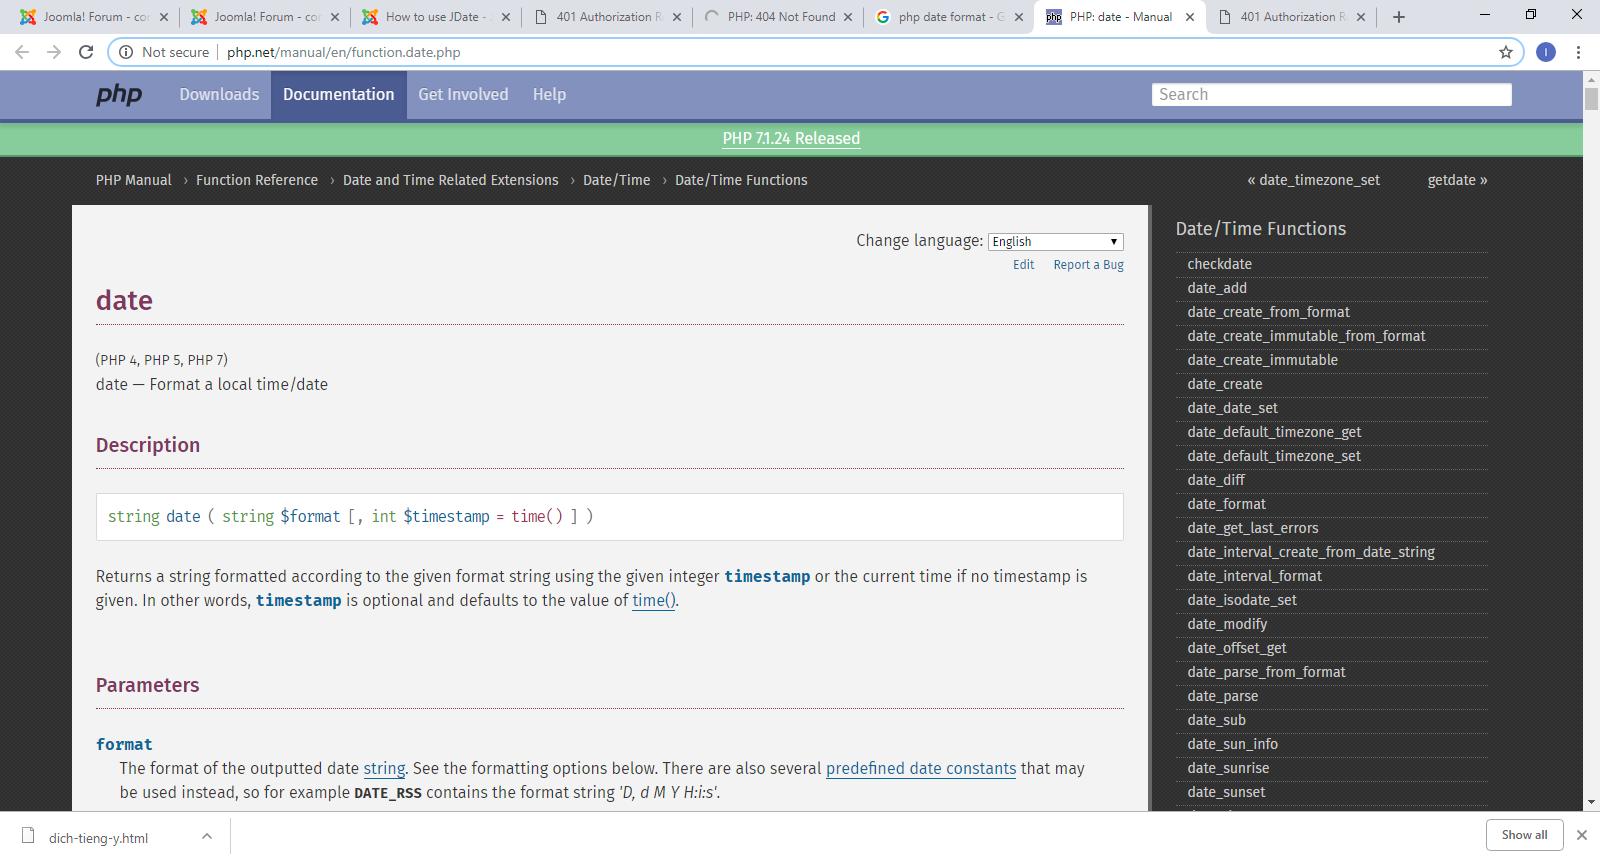 Joomla! Issue Tracker   Joomla! CMS #23082 - Change the URL to the